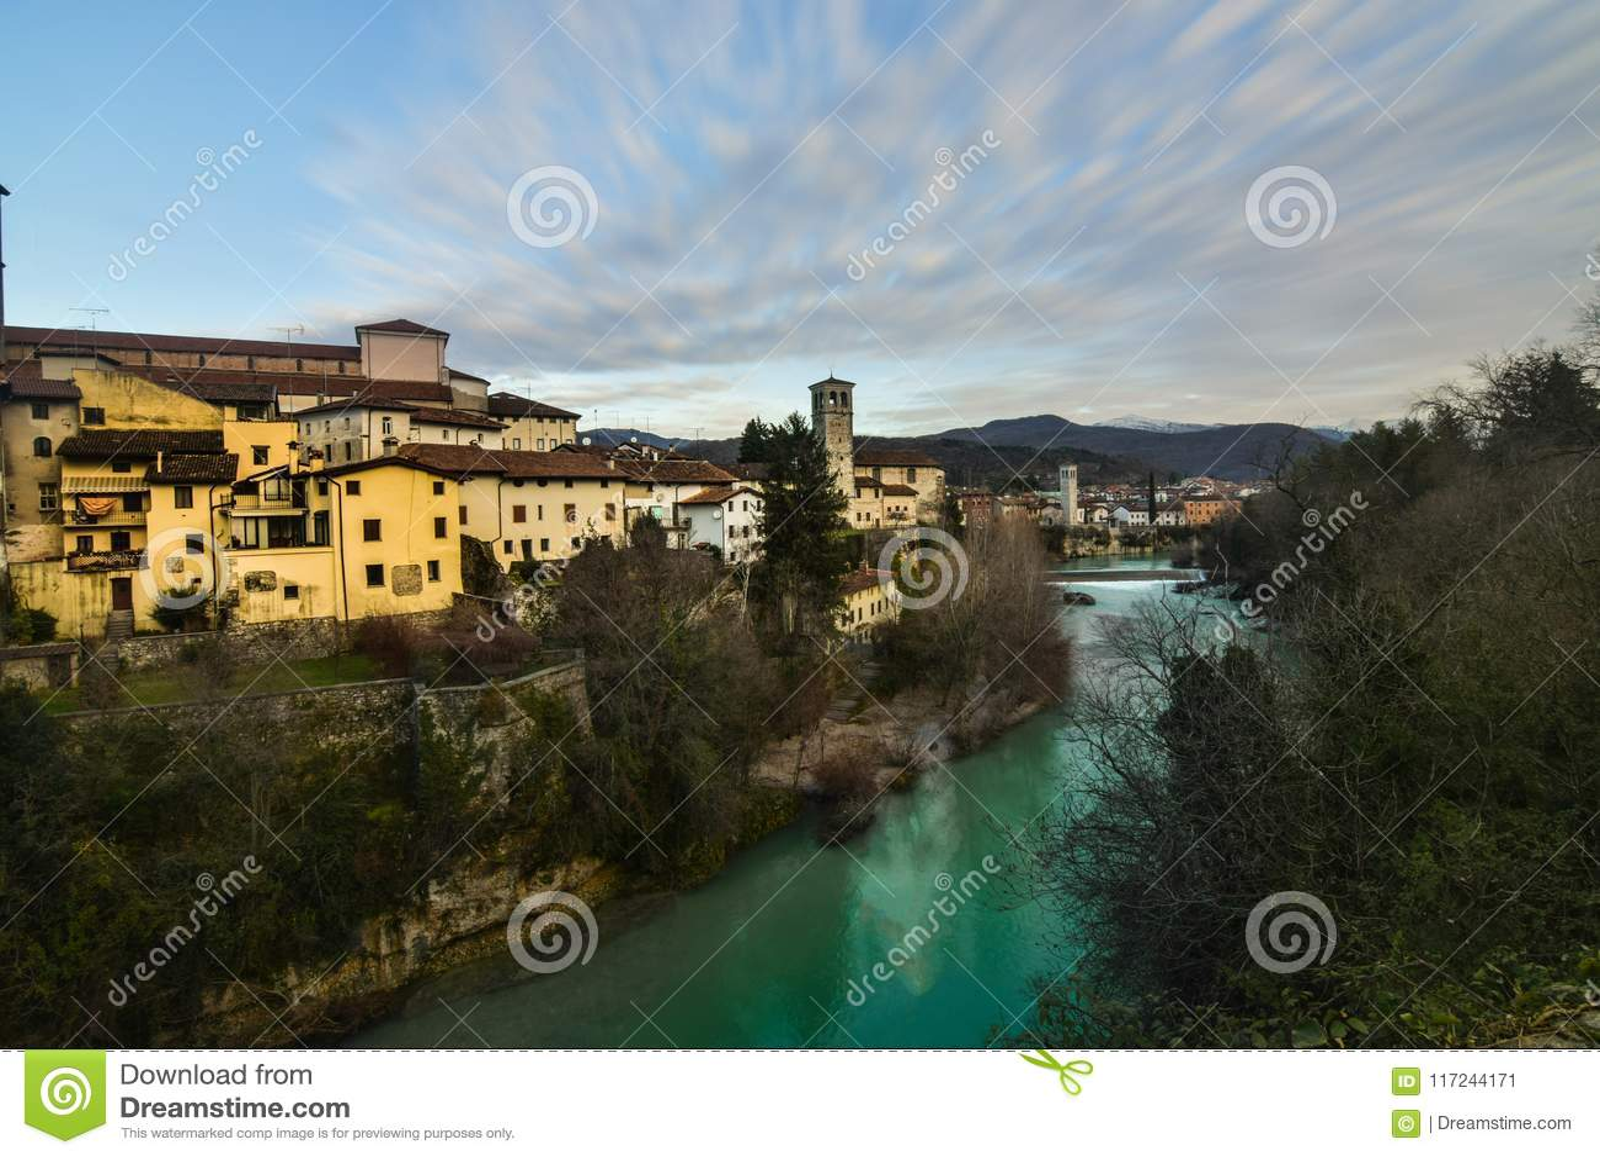 A view of Cividale del Friuli, Italy